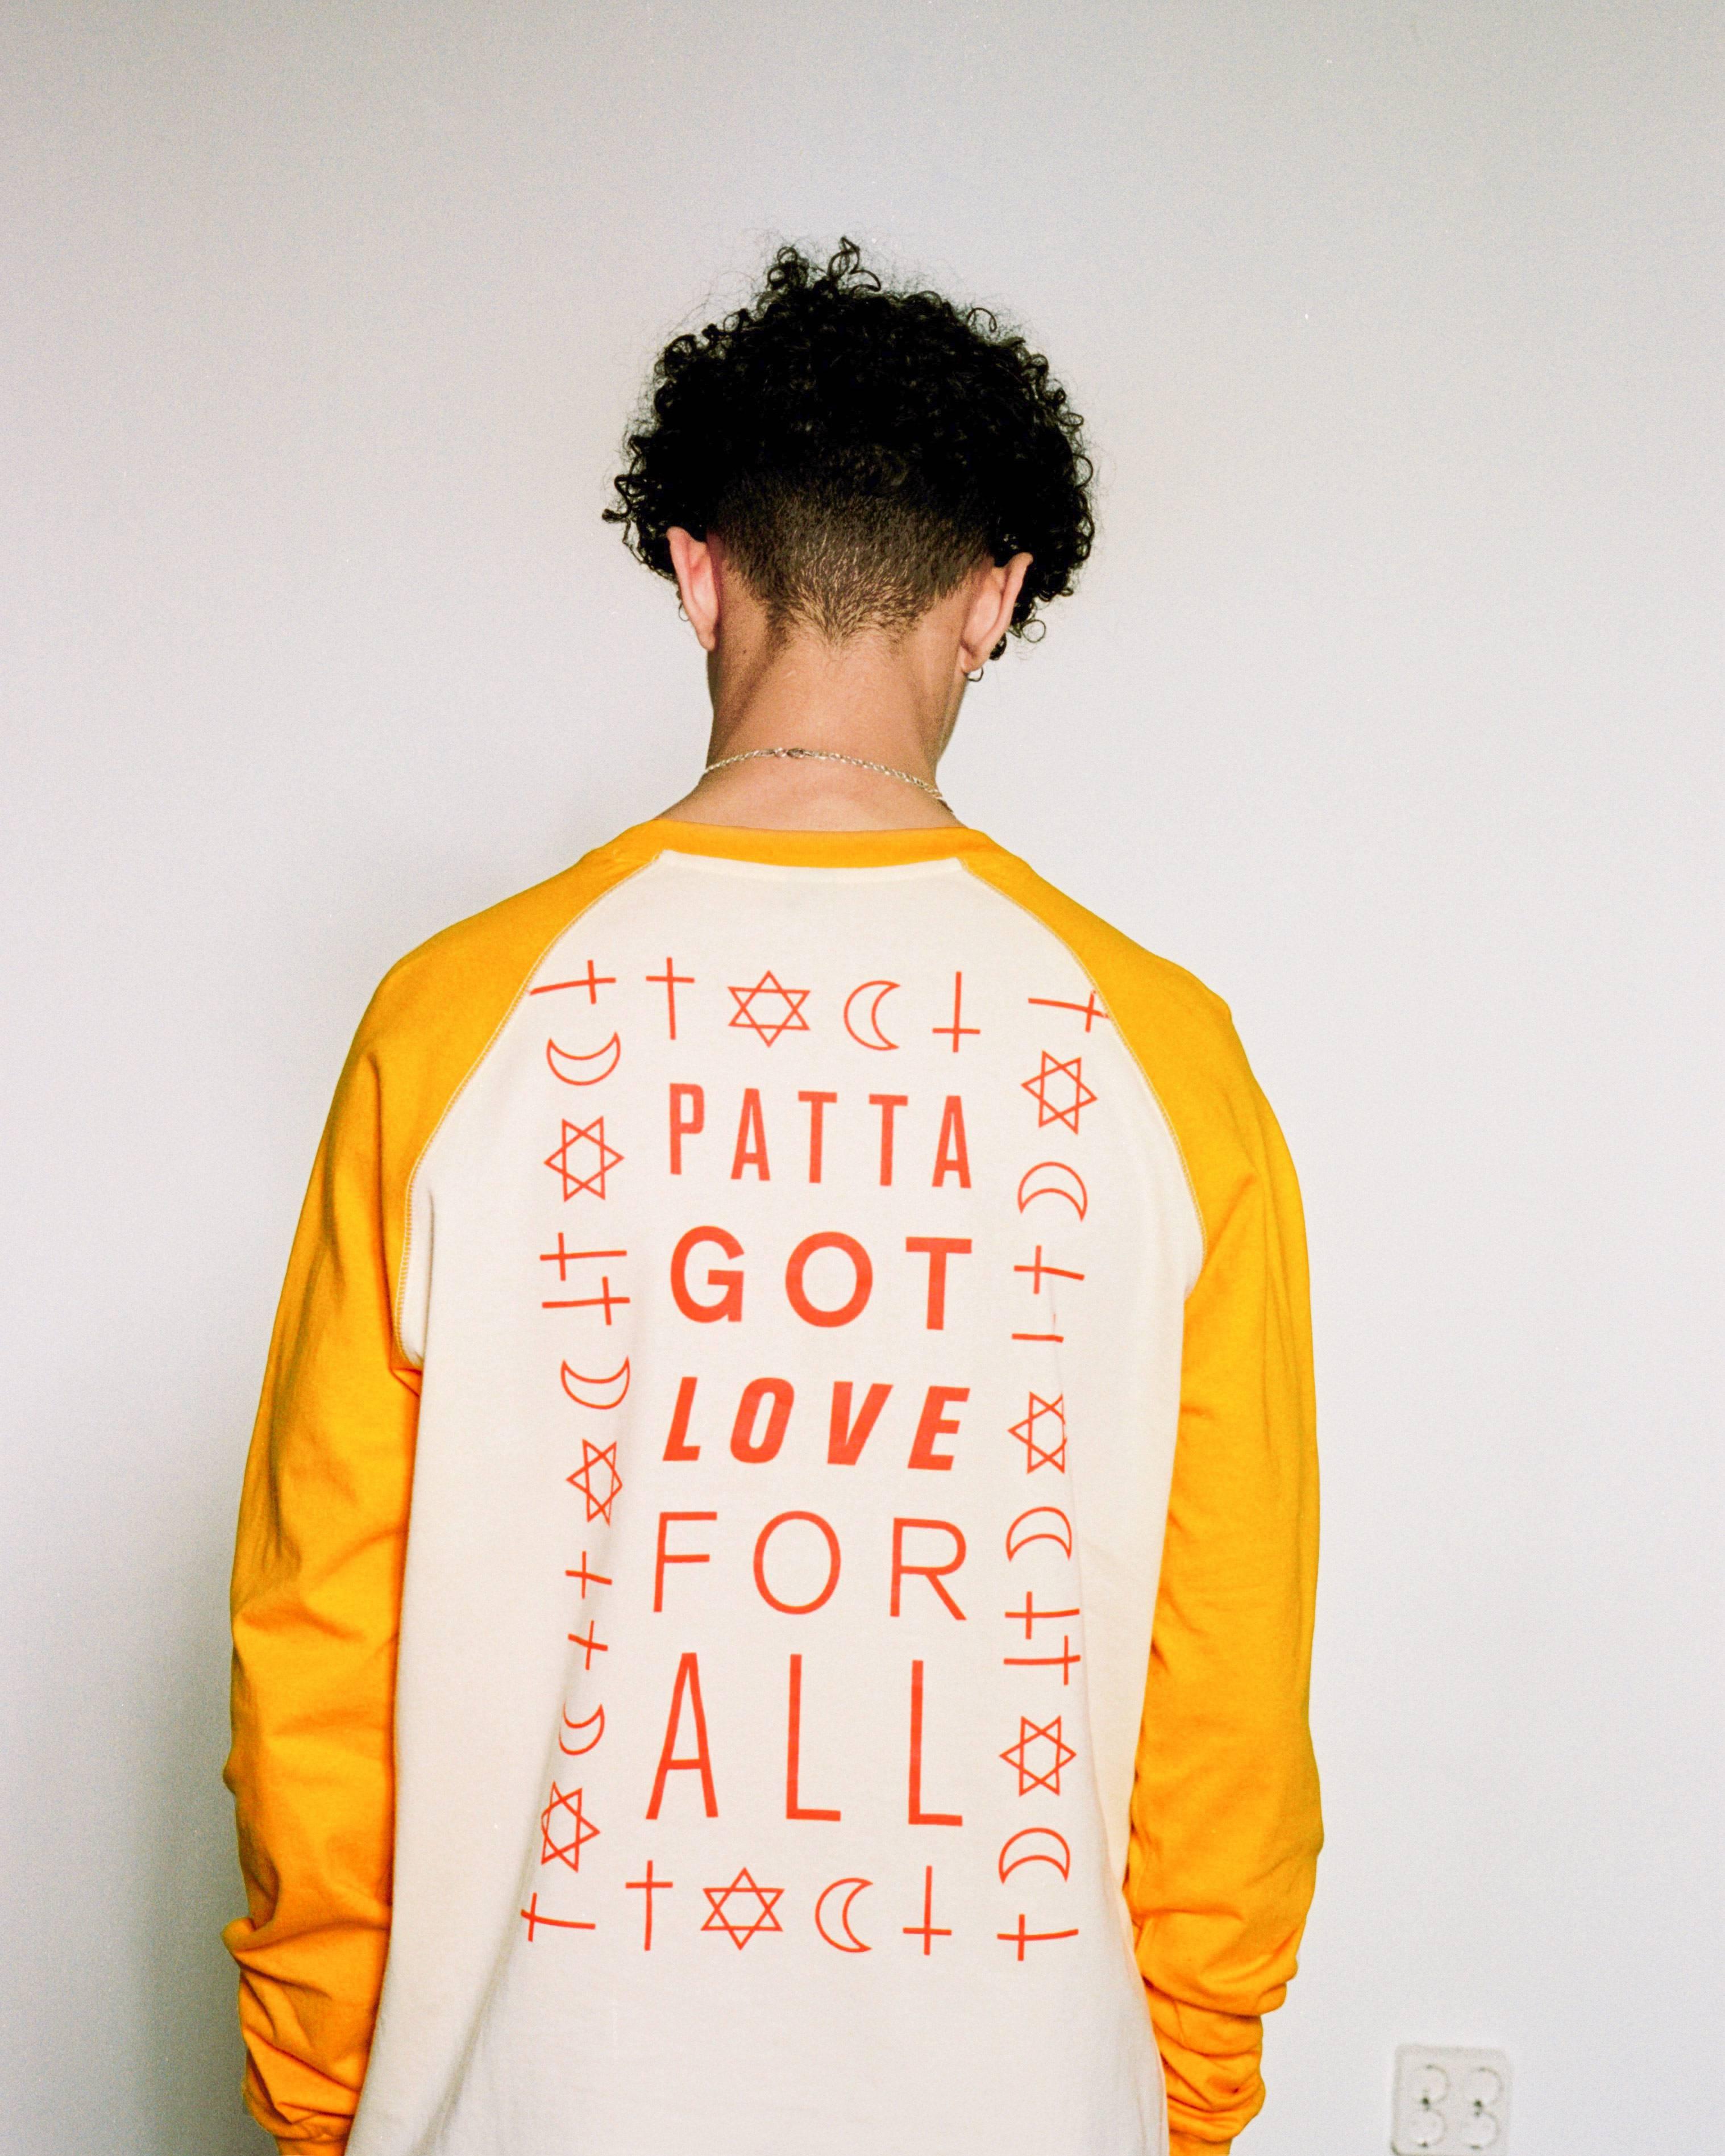 PATTA SS 2019 WEEK 18